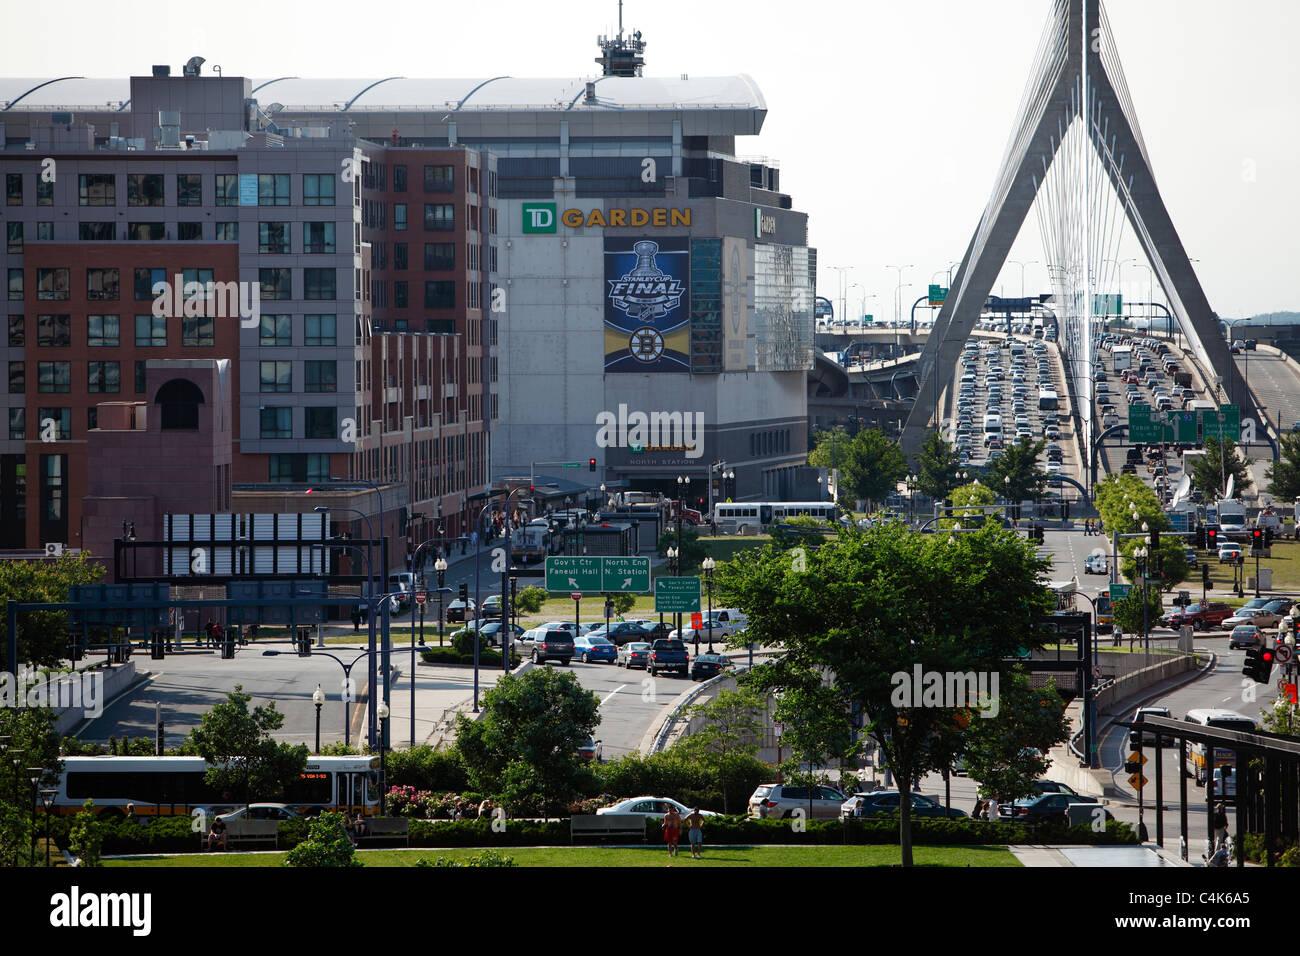 Boston Garden, Zakim Bridge y el Greenway, Boston, Massachusetts Imagen De Stock